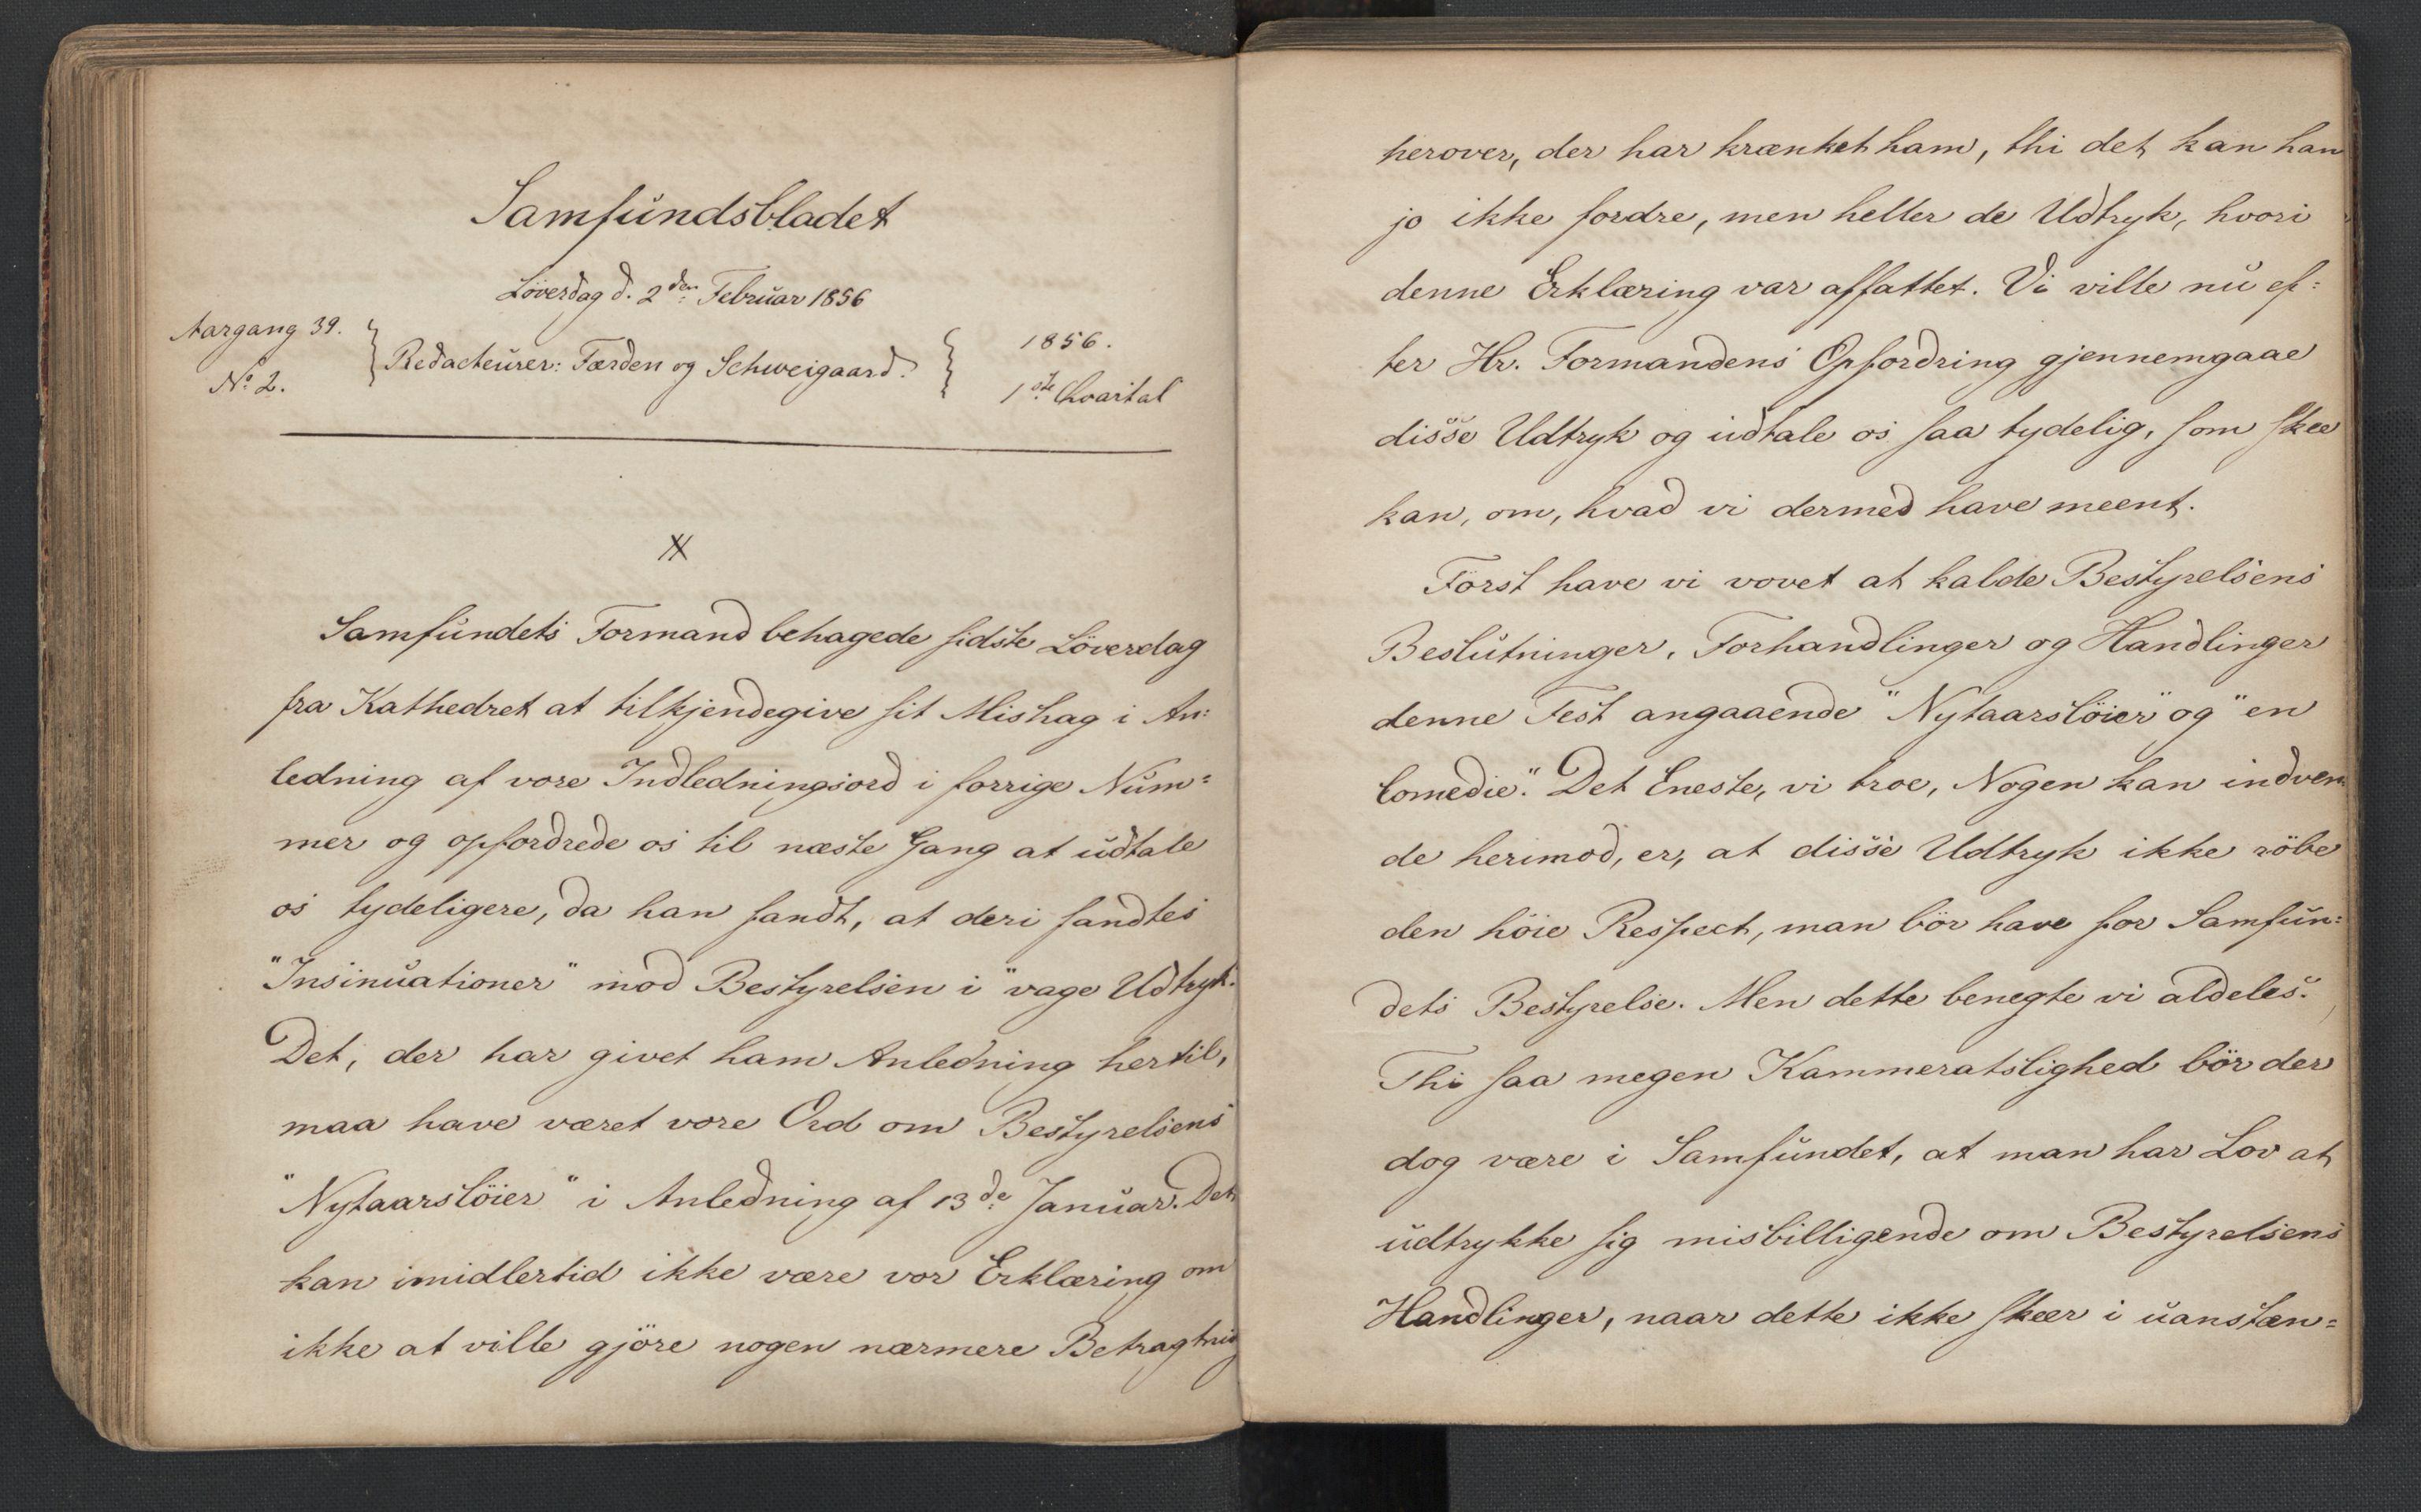 RA, Det Norske Studentersamfund, X/Xa/L0005, 1855-1856, s. 97